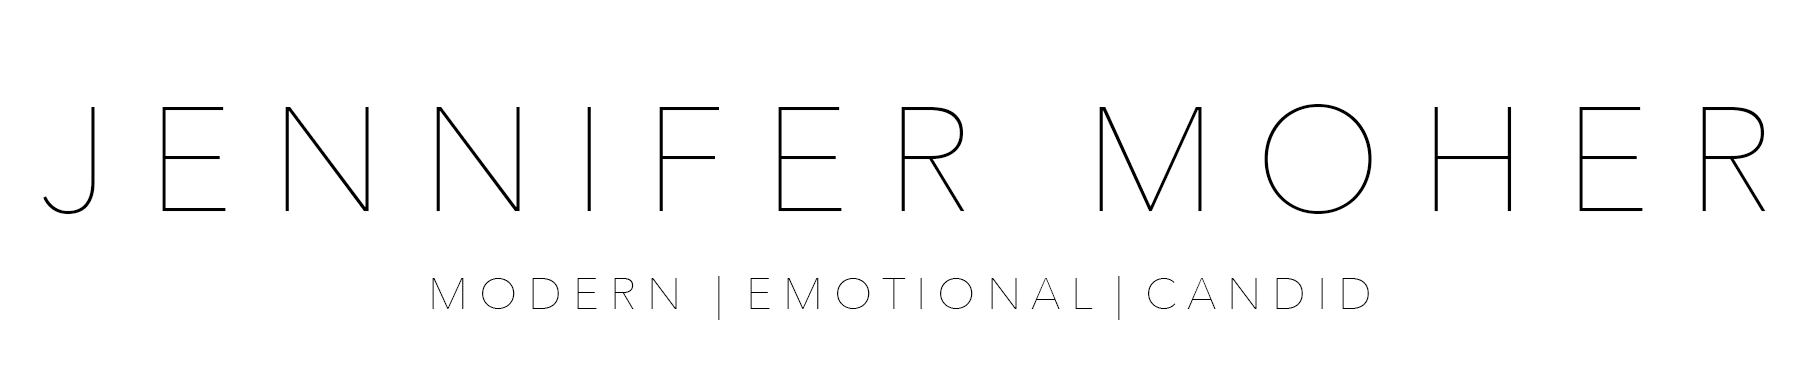 https://www.jennifermoher.com/wp-content/uploads/2019/05/logonew-copy.png